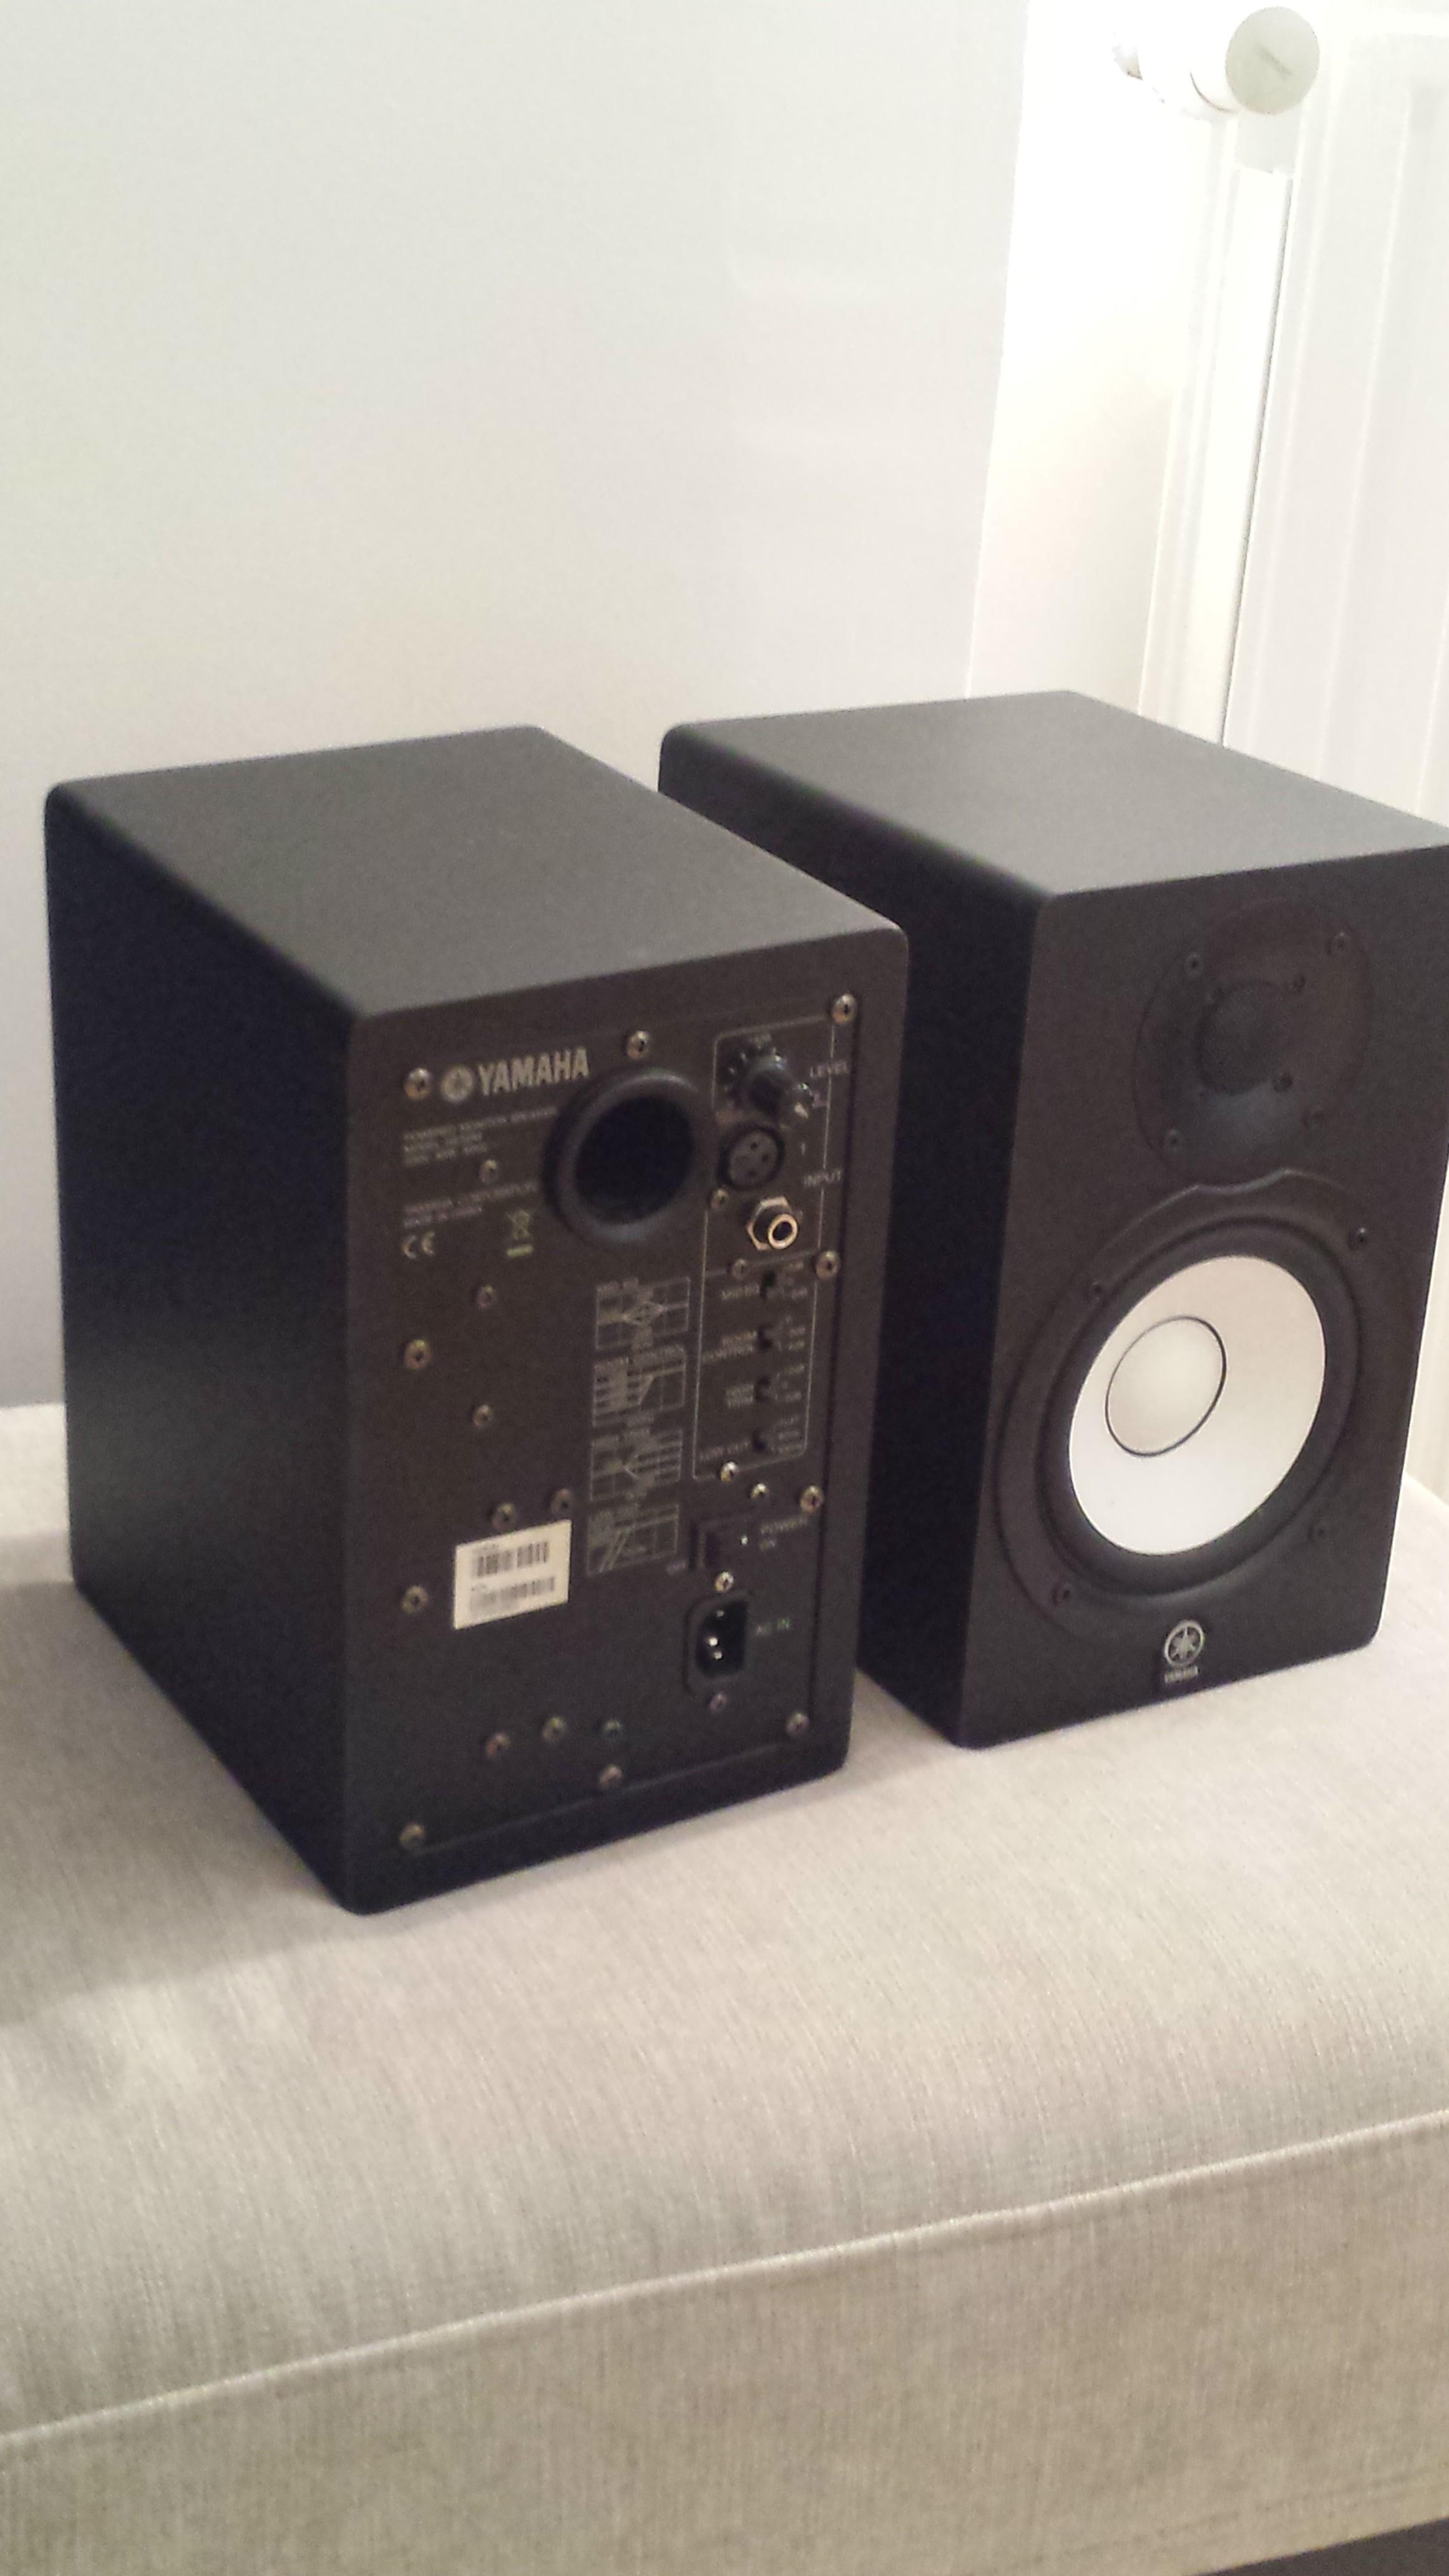 Yamaha hs50m image 959133 audiofanzine for Yamaha hs50m review